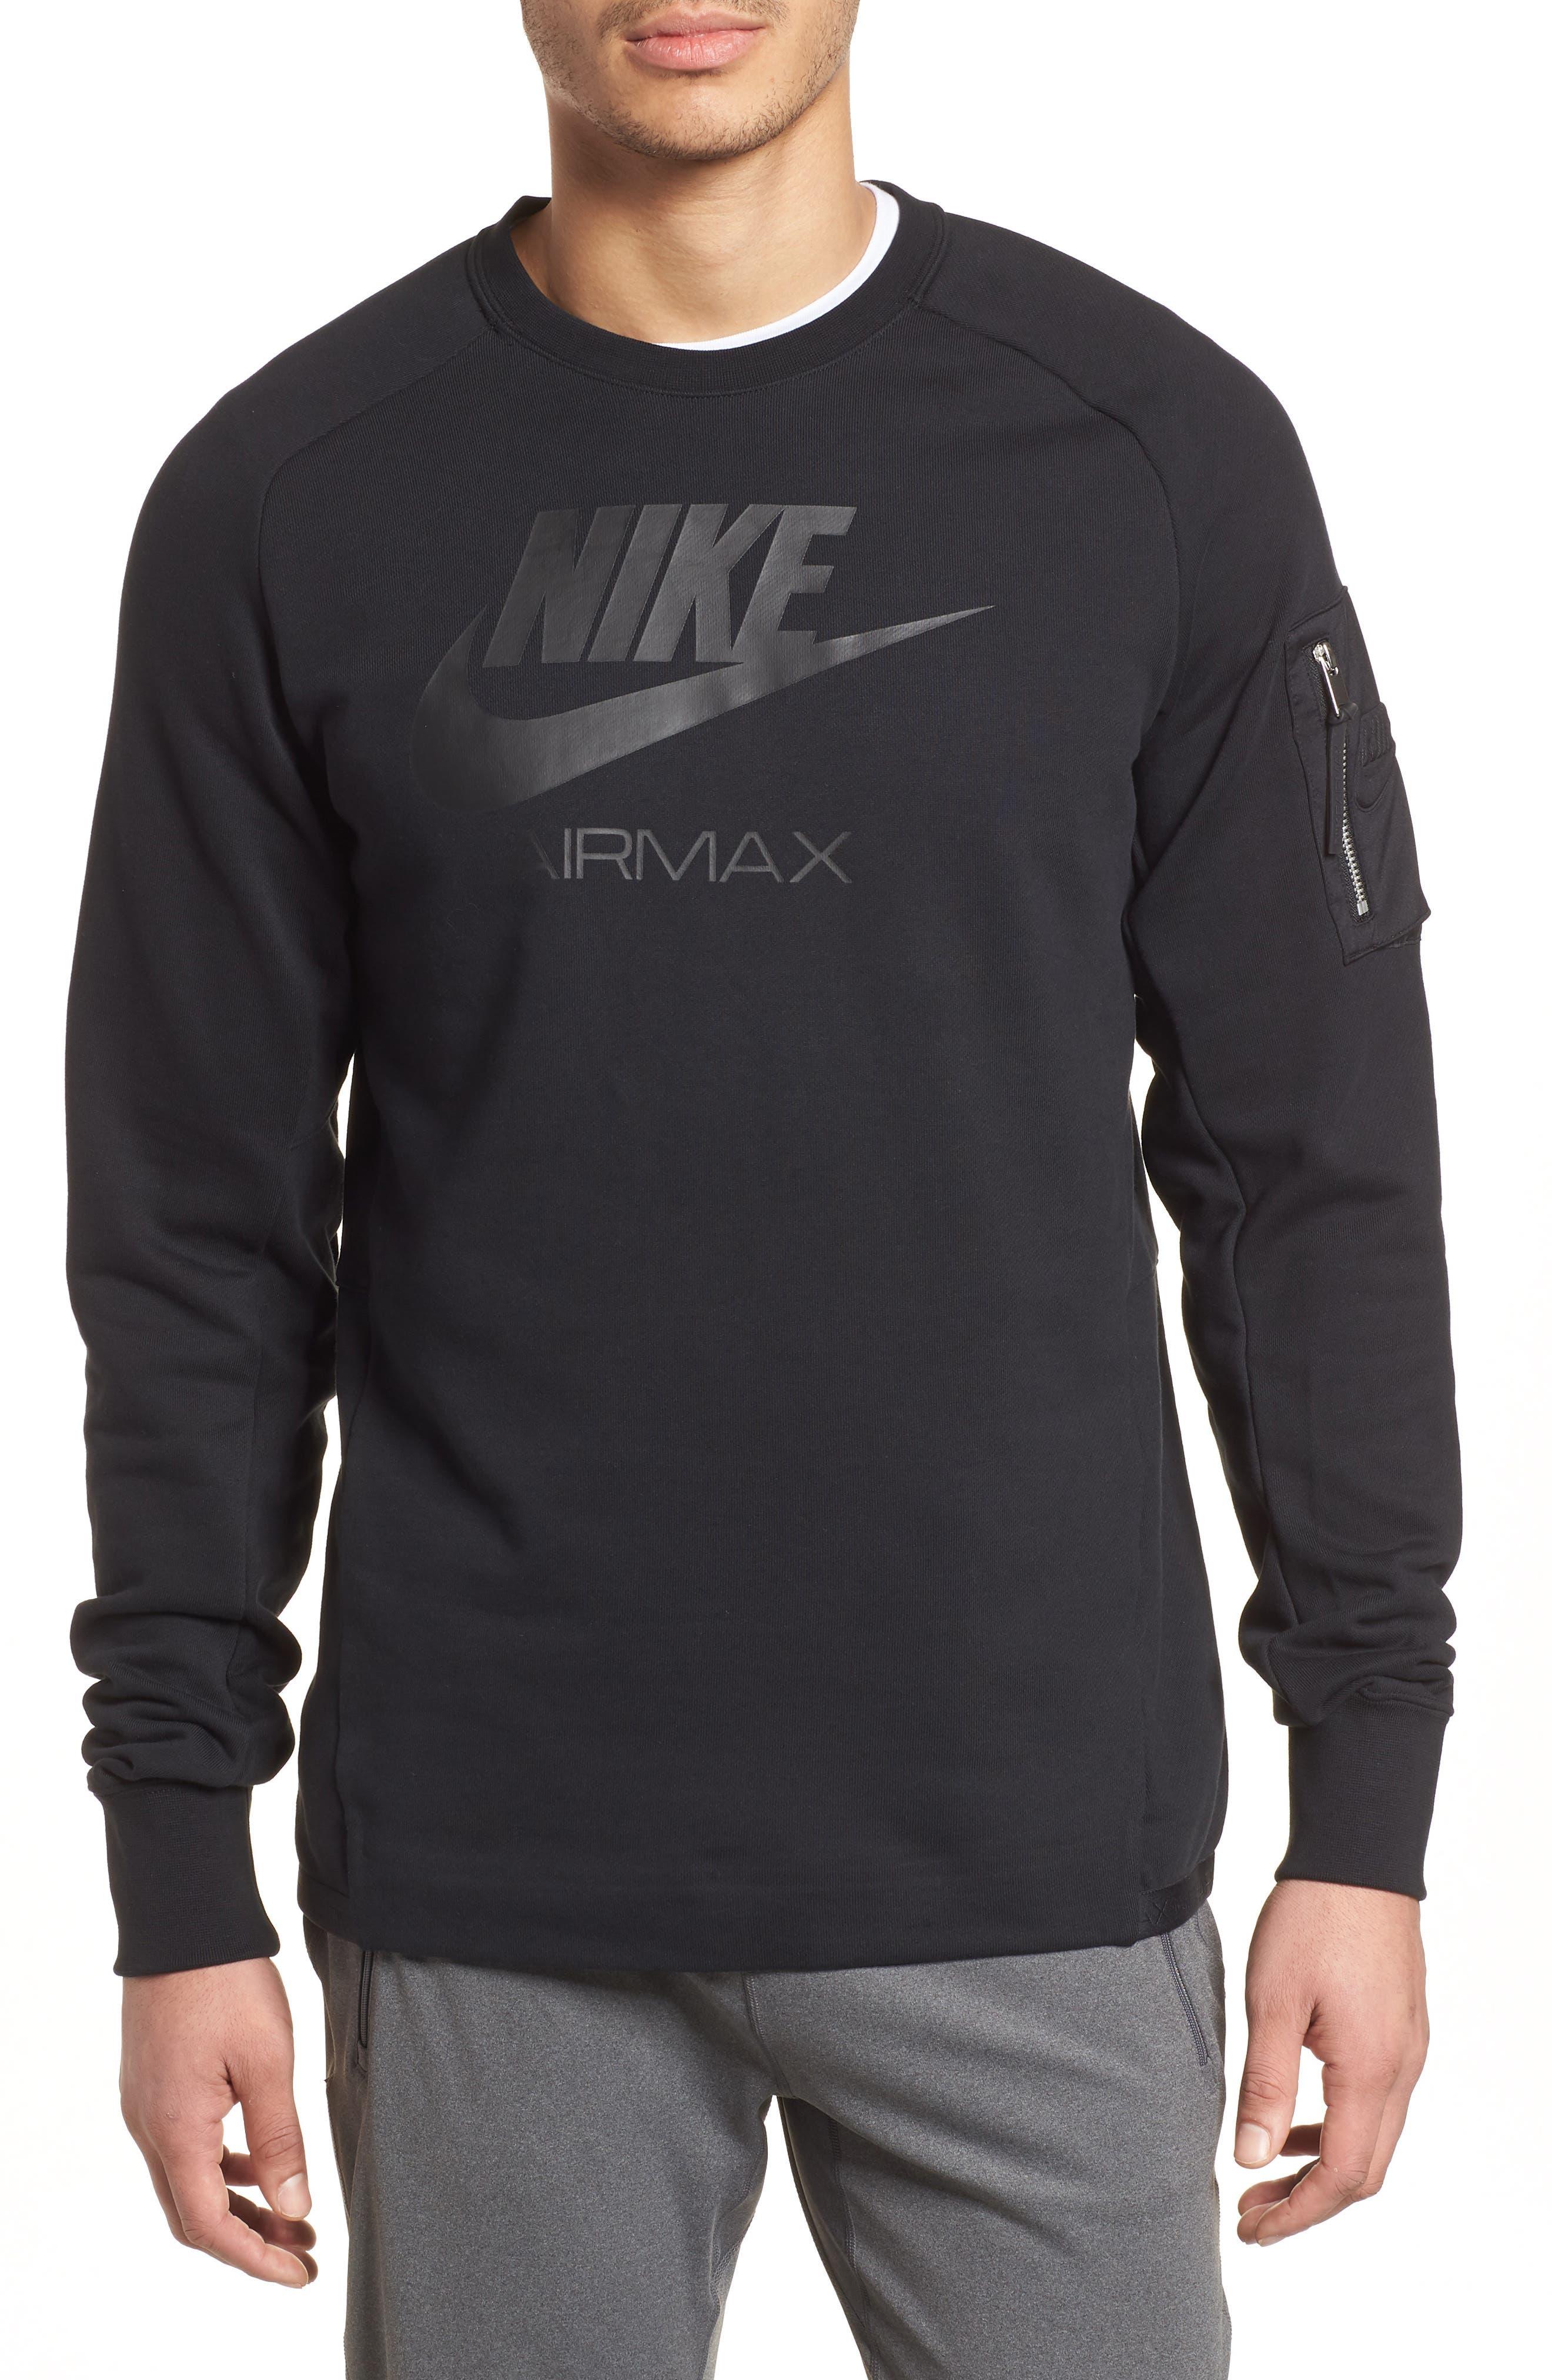 NSW Air Max Crewneck Sweatshirt,                         Main,                         color, Black/ Black/ Black